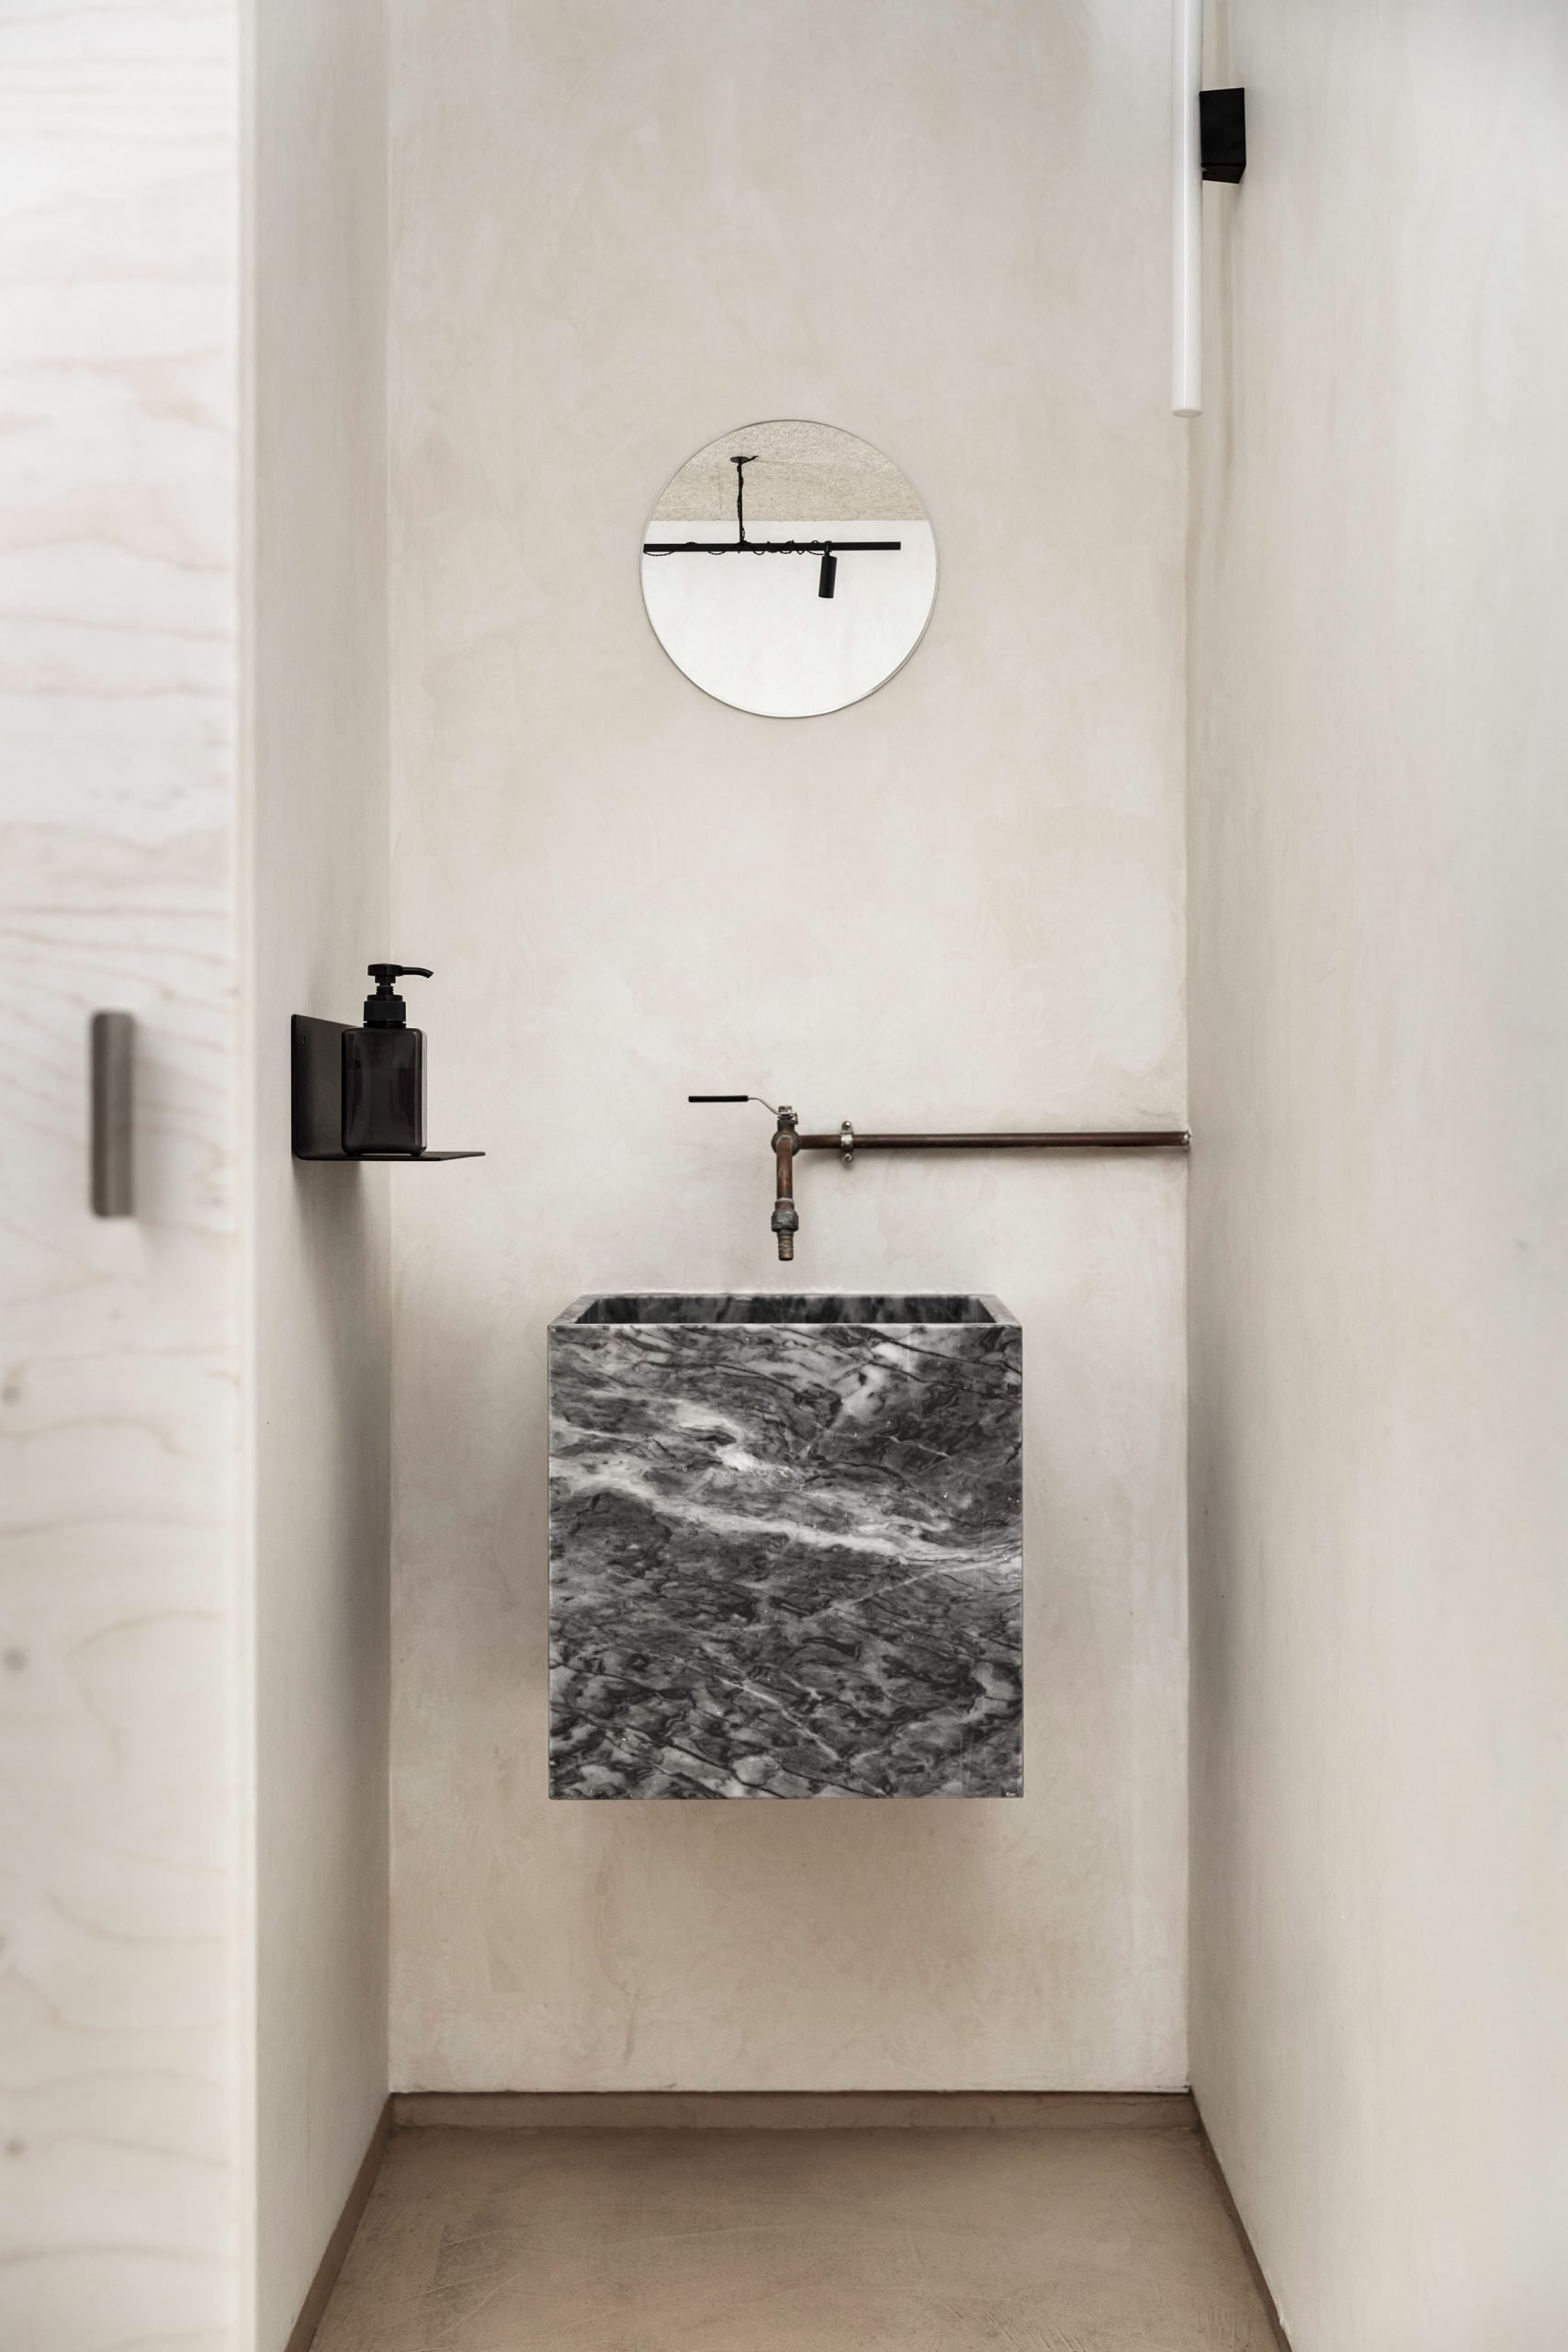 Bathroom of Zuppa restaurant by Plantea Estudio with marble floating sink